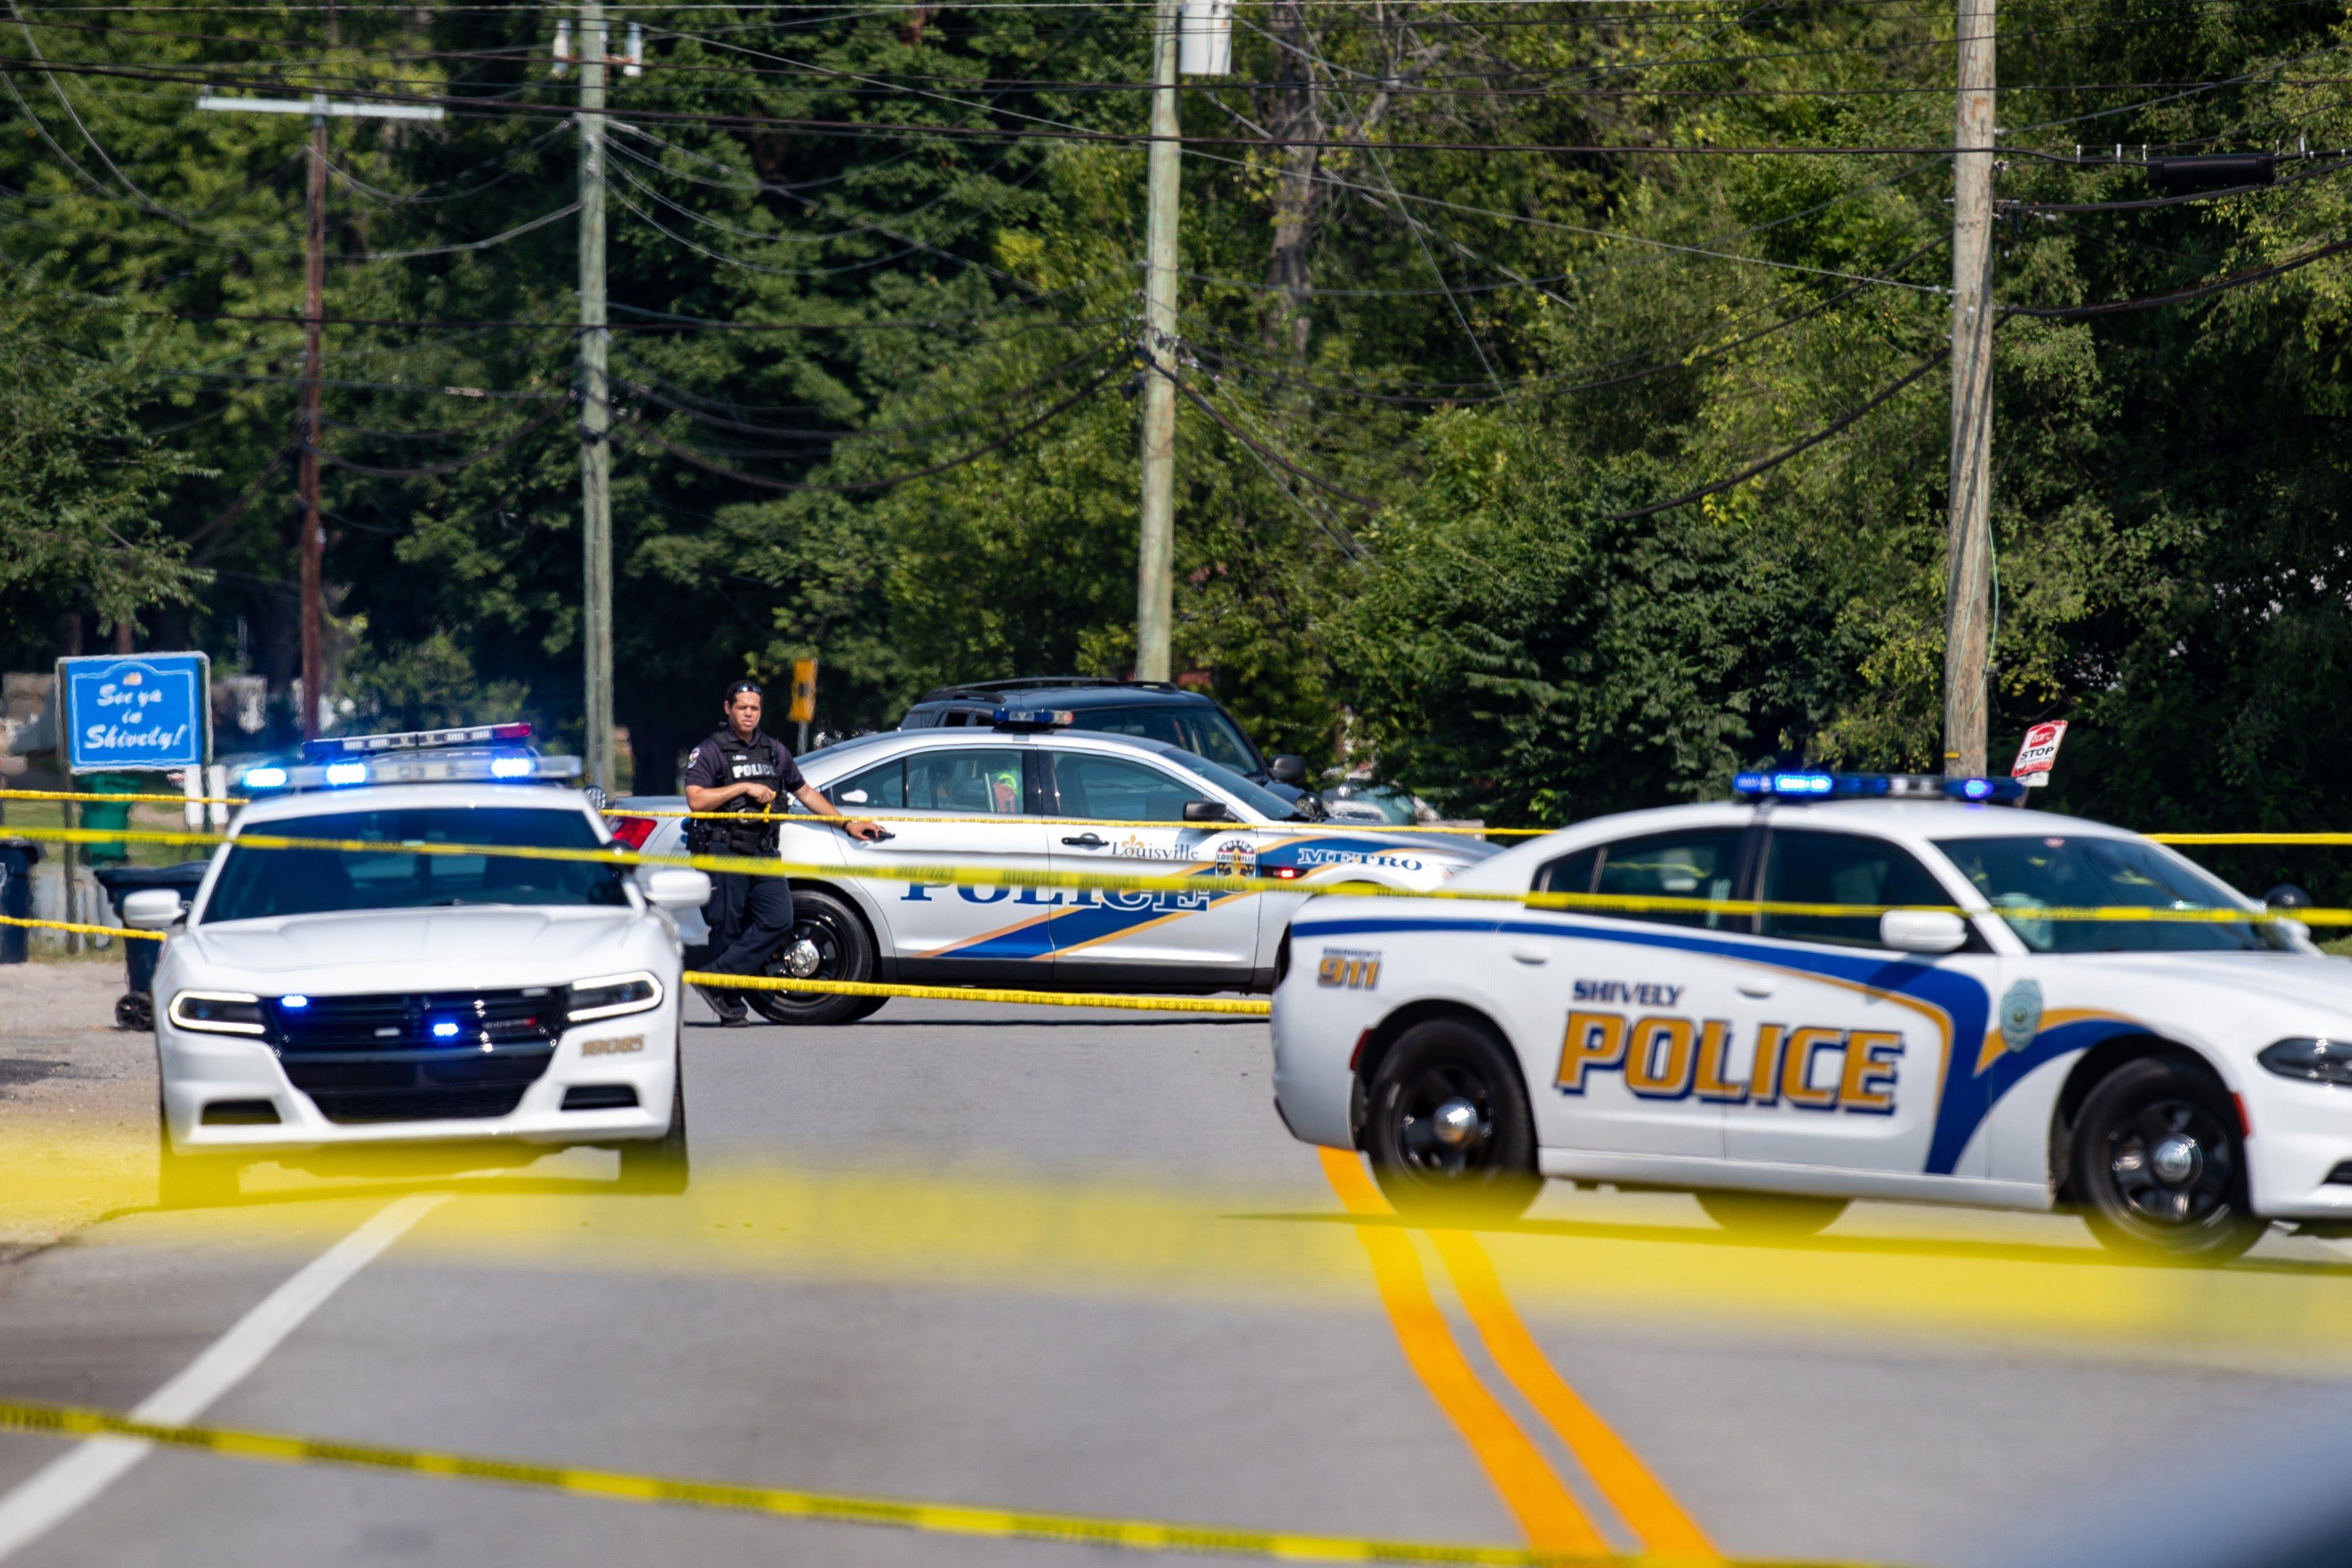 Kentucky sheriff's deputy shot, killed in ambush attack, police say